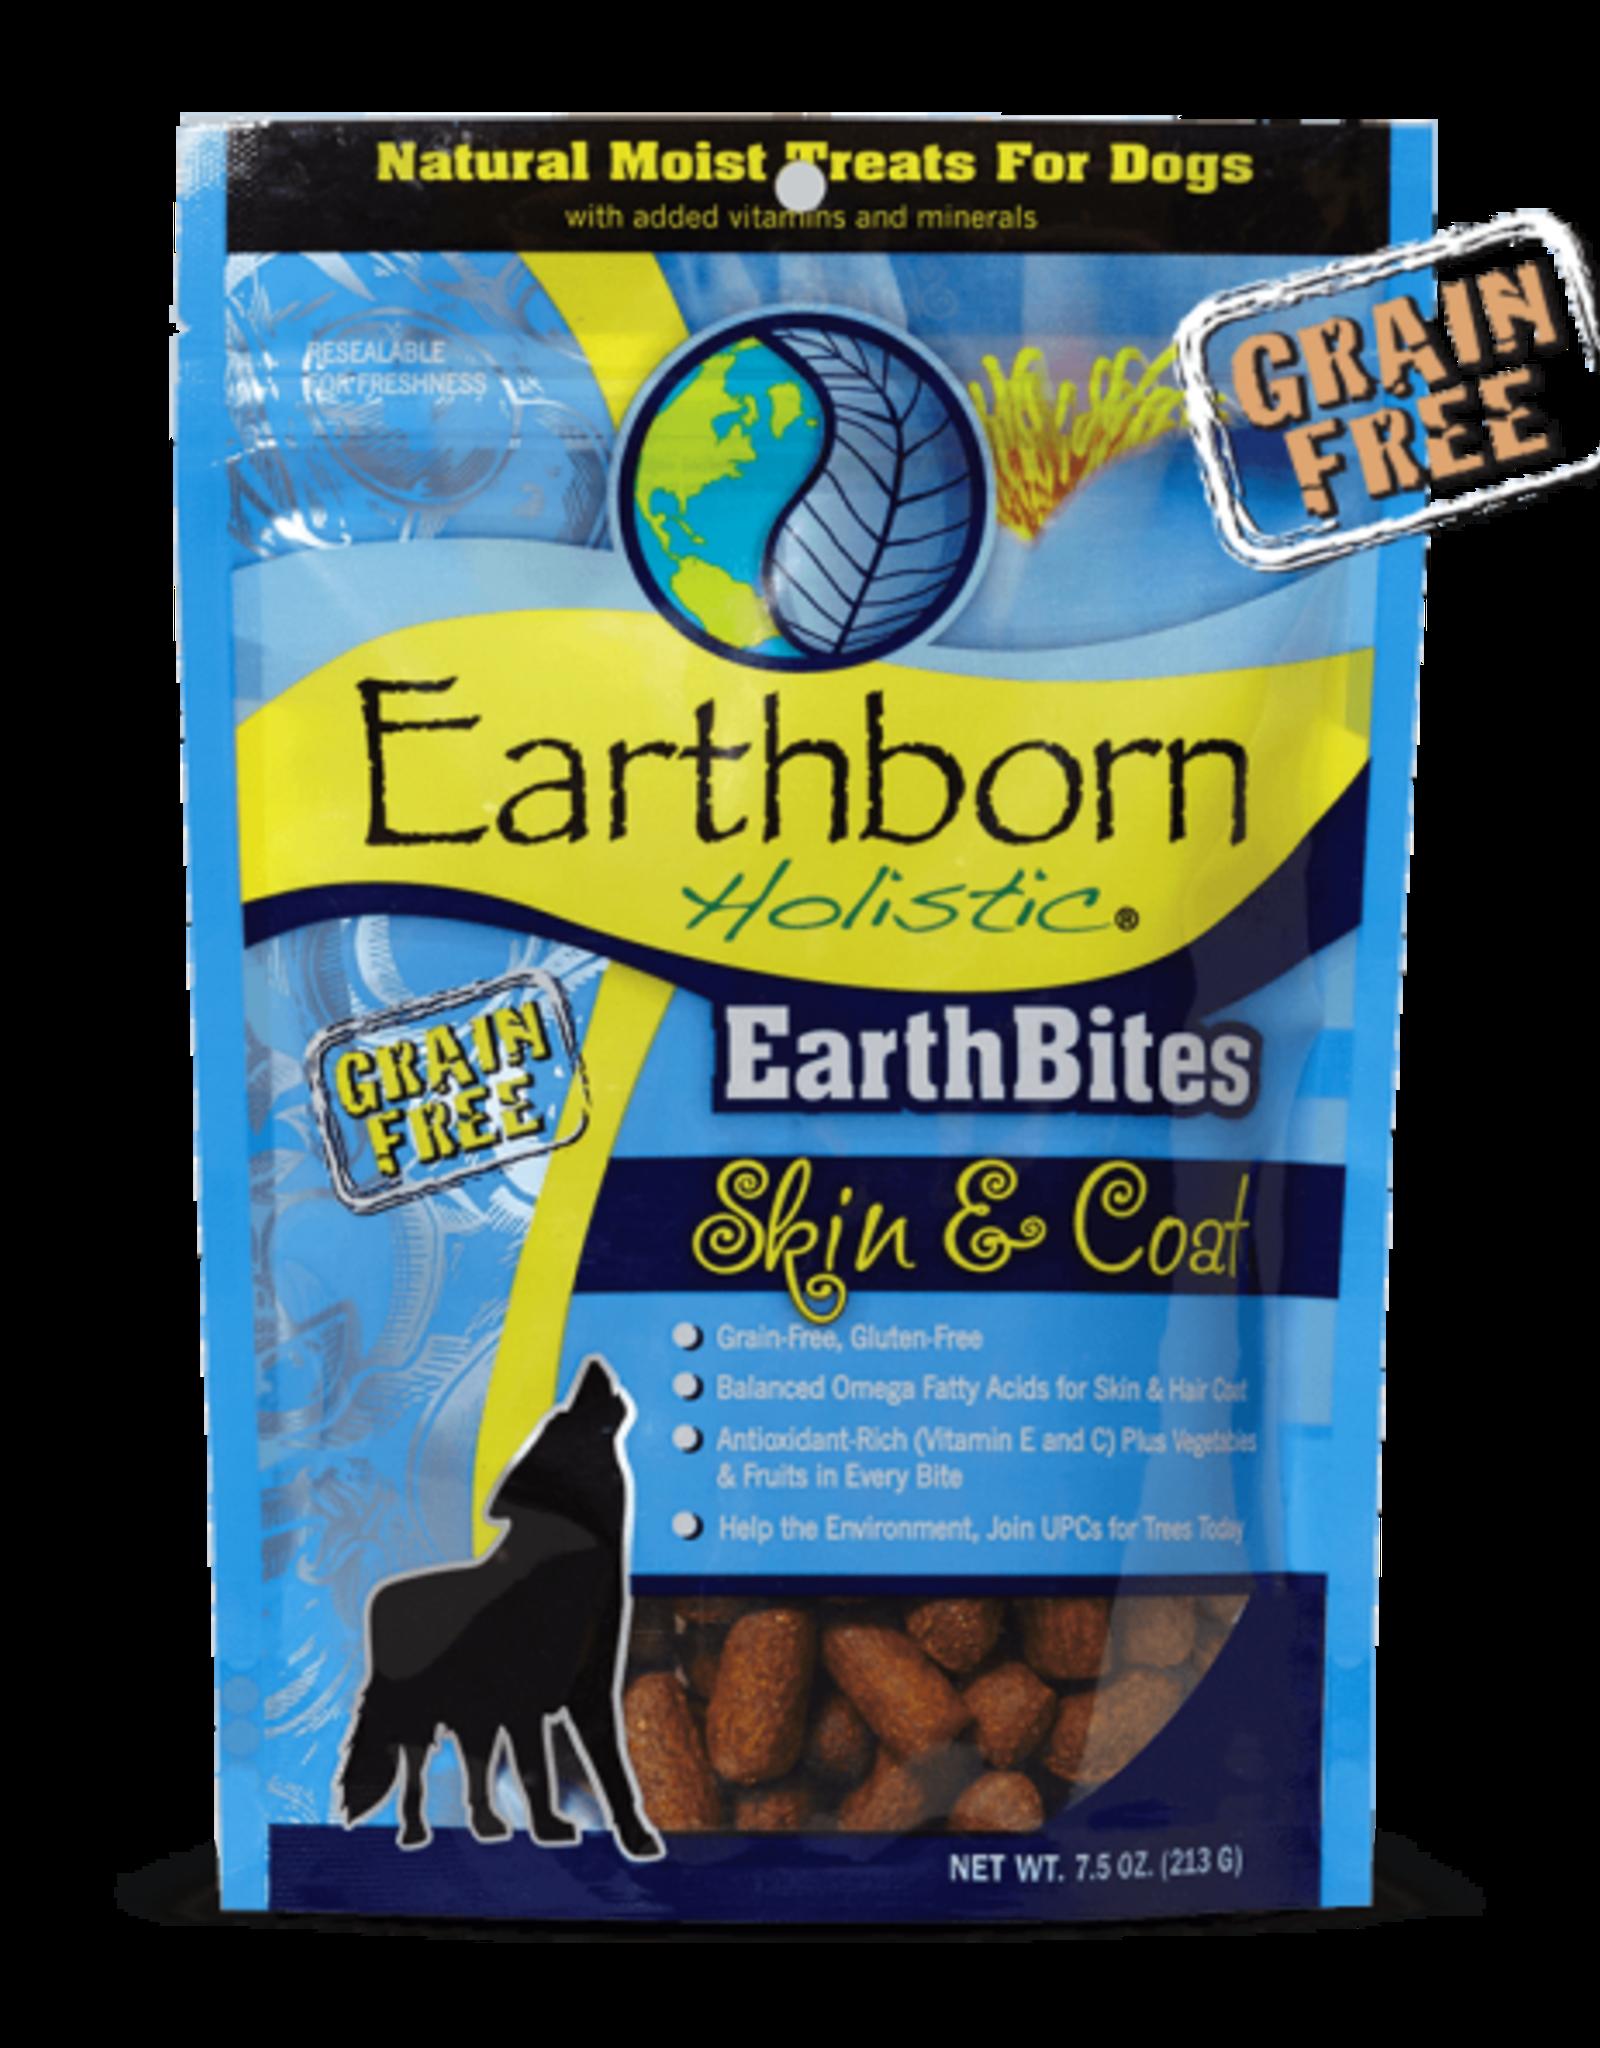 Earthborn Holistic Earthbites Skin & Coat - 7.5oz